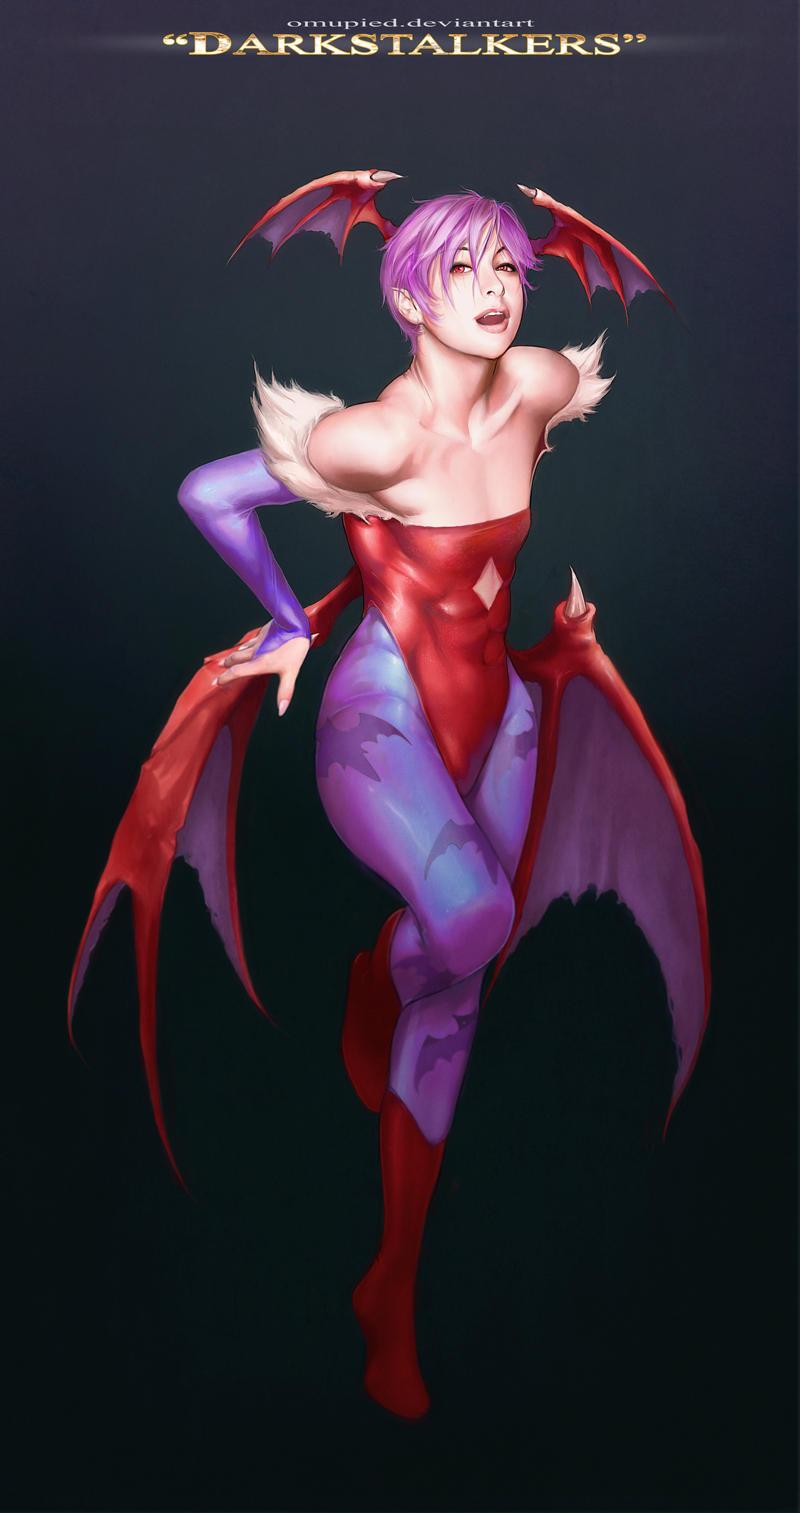 Lilith Darkstalkers FanArt by omupied